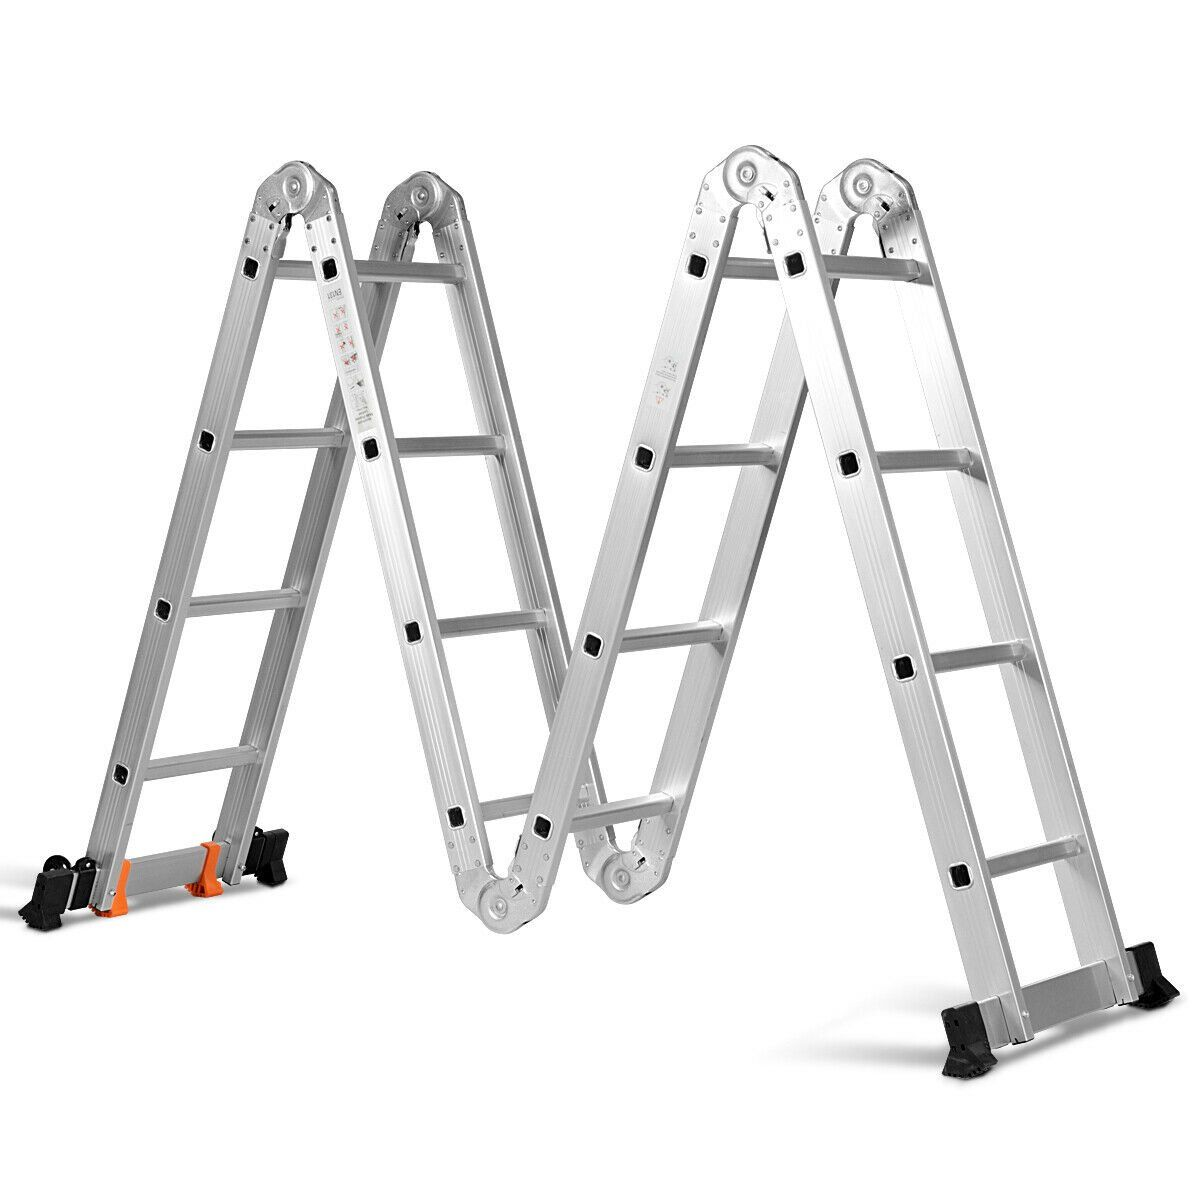 15 5 16 Step Multi Purpose Aluminum Folding Scaffold Ladder In 2020 Scaffold Ladder Ladder Folding Ladder